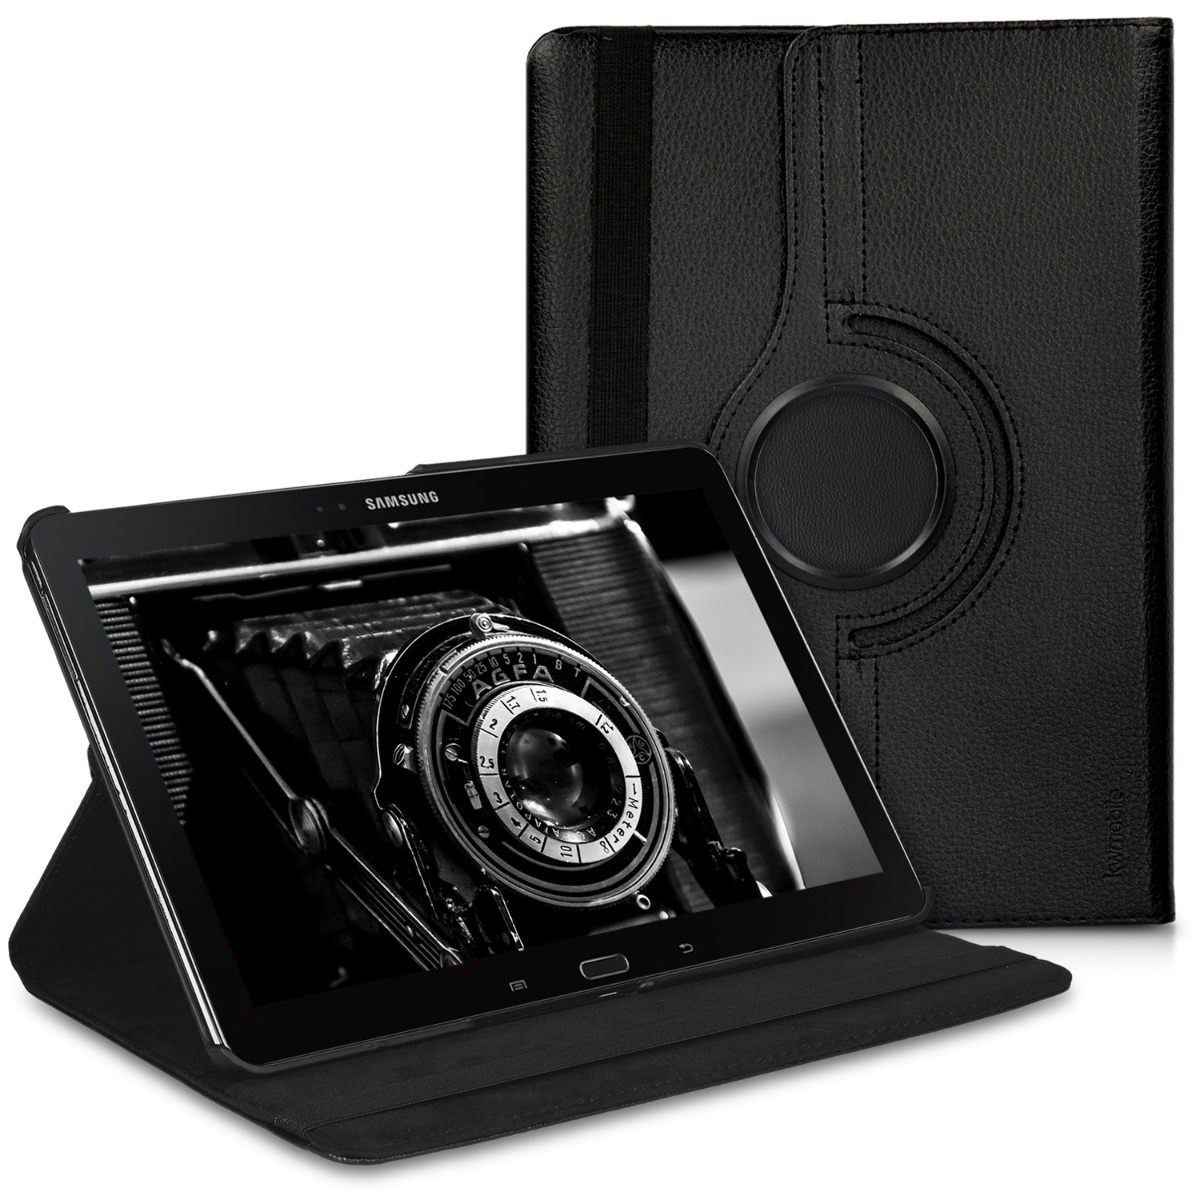 Kožené pouzdro pro Samsung Note 10.1 2014 Edition - černé